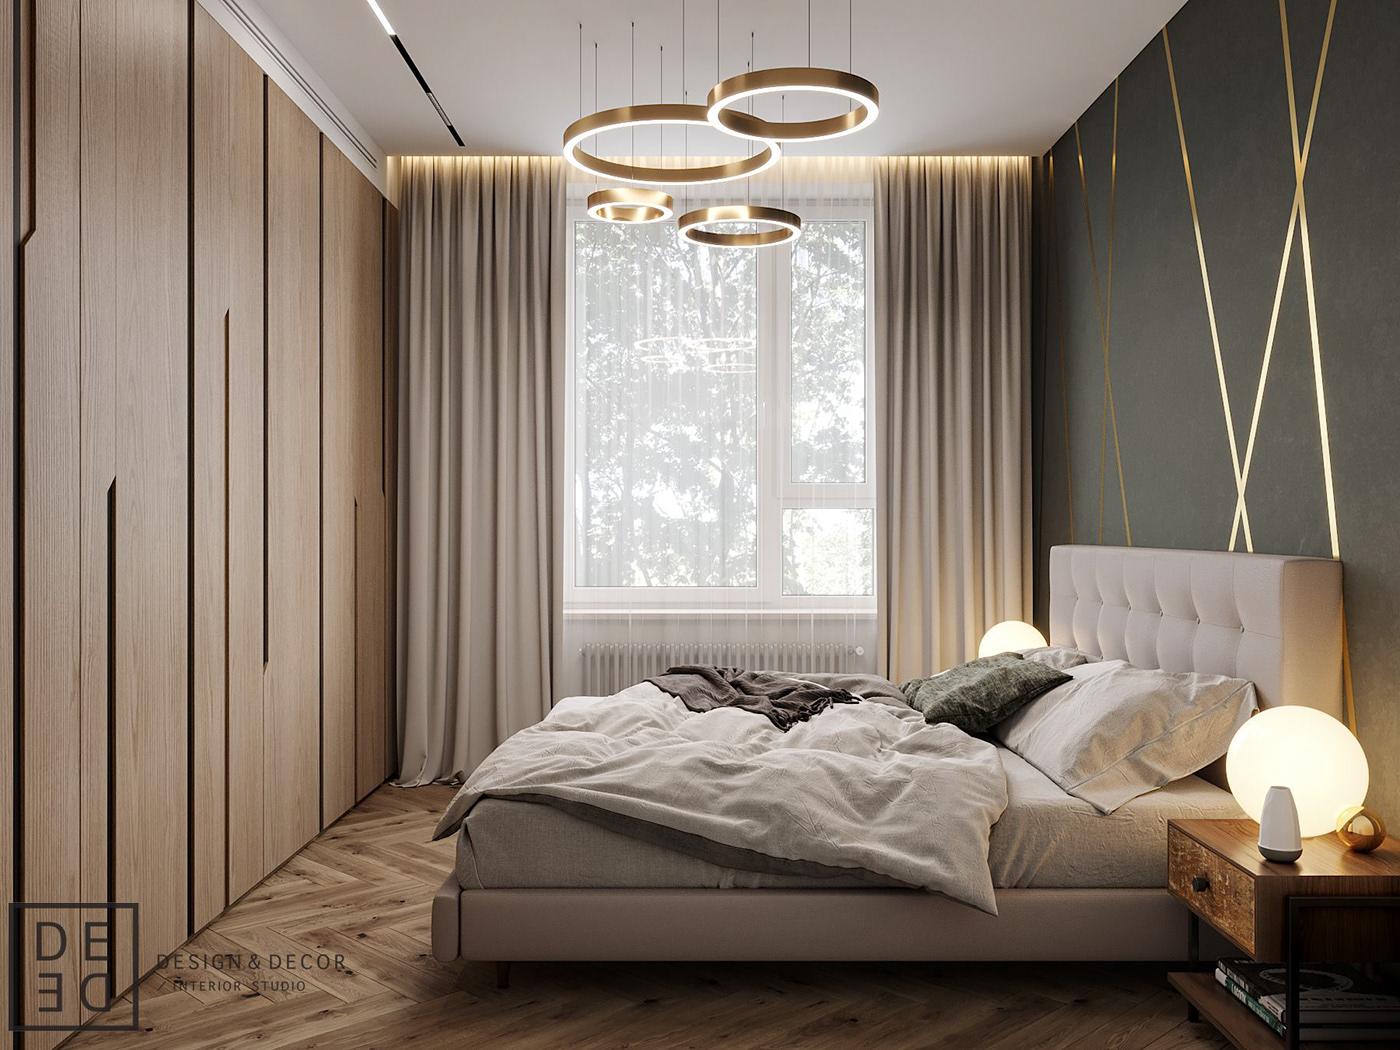 Interior architecture interiordesign Minimalism modern DE&DE Interior Studio corona render  3dsmax